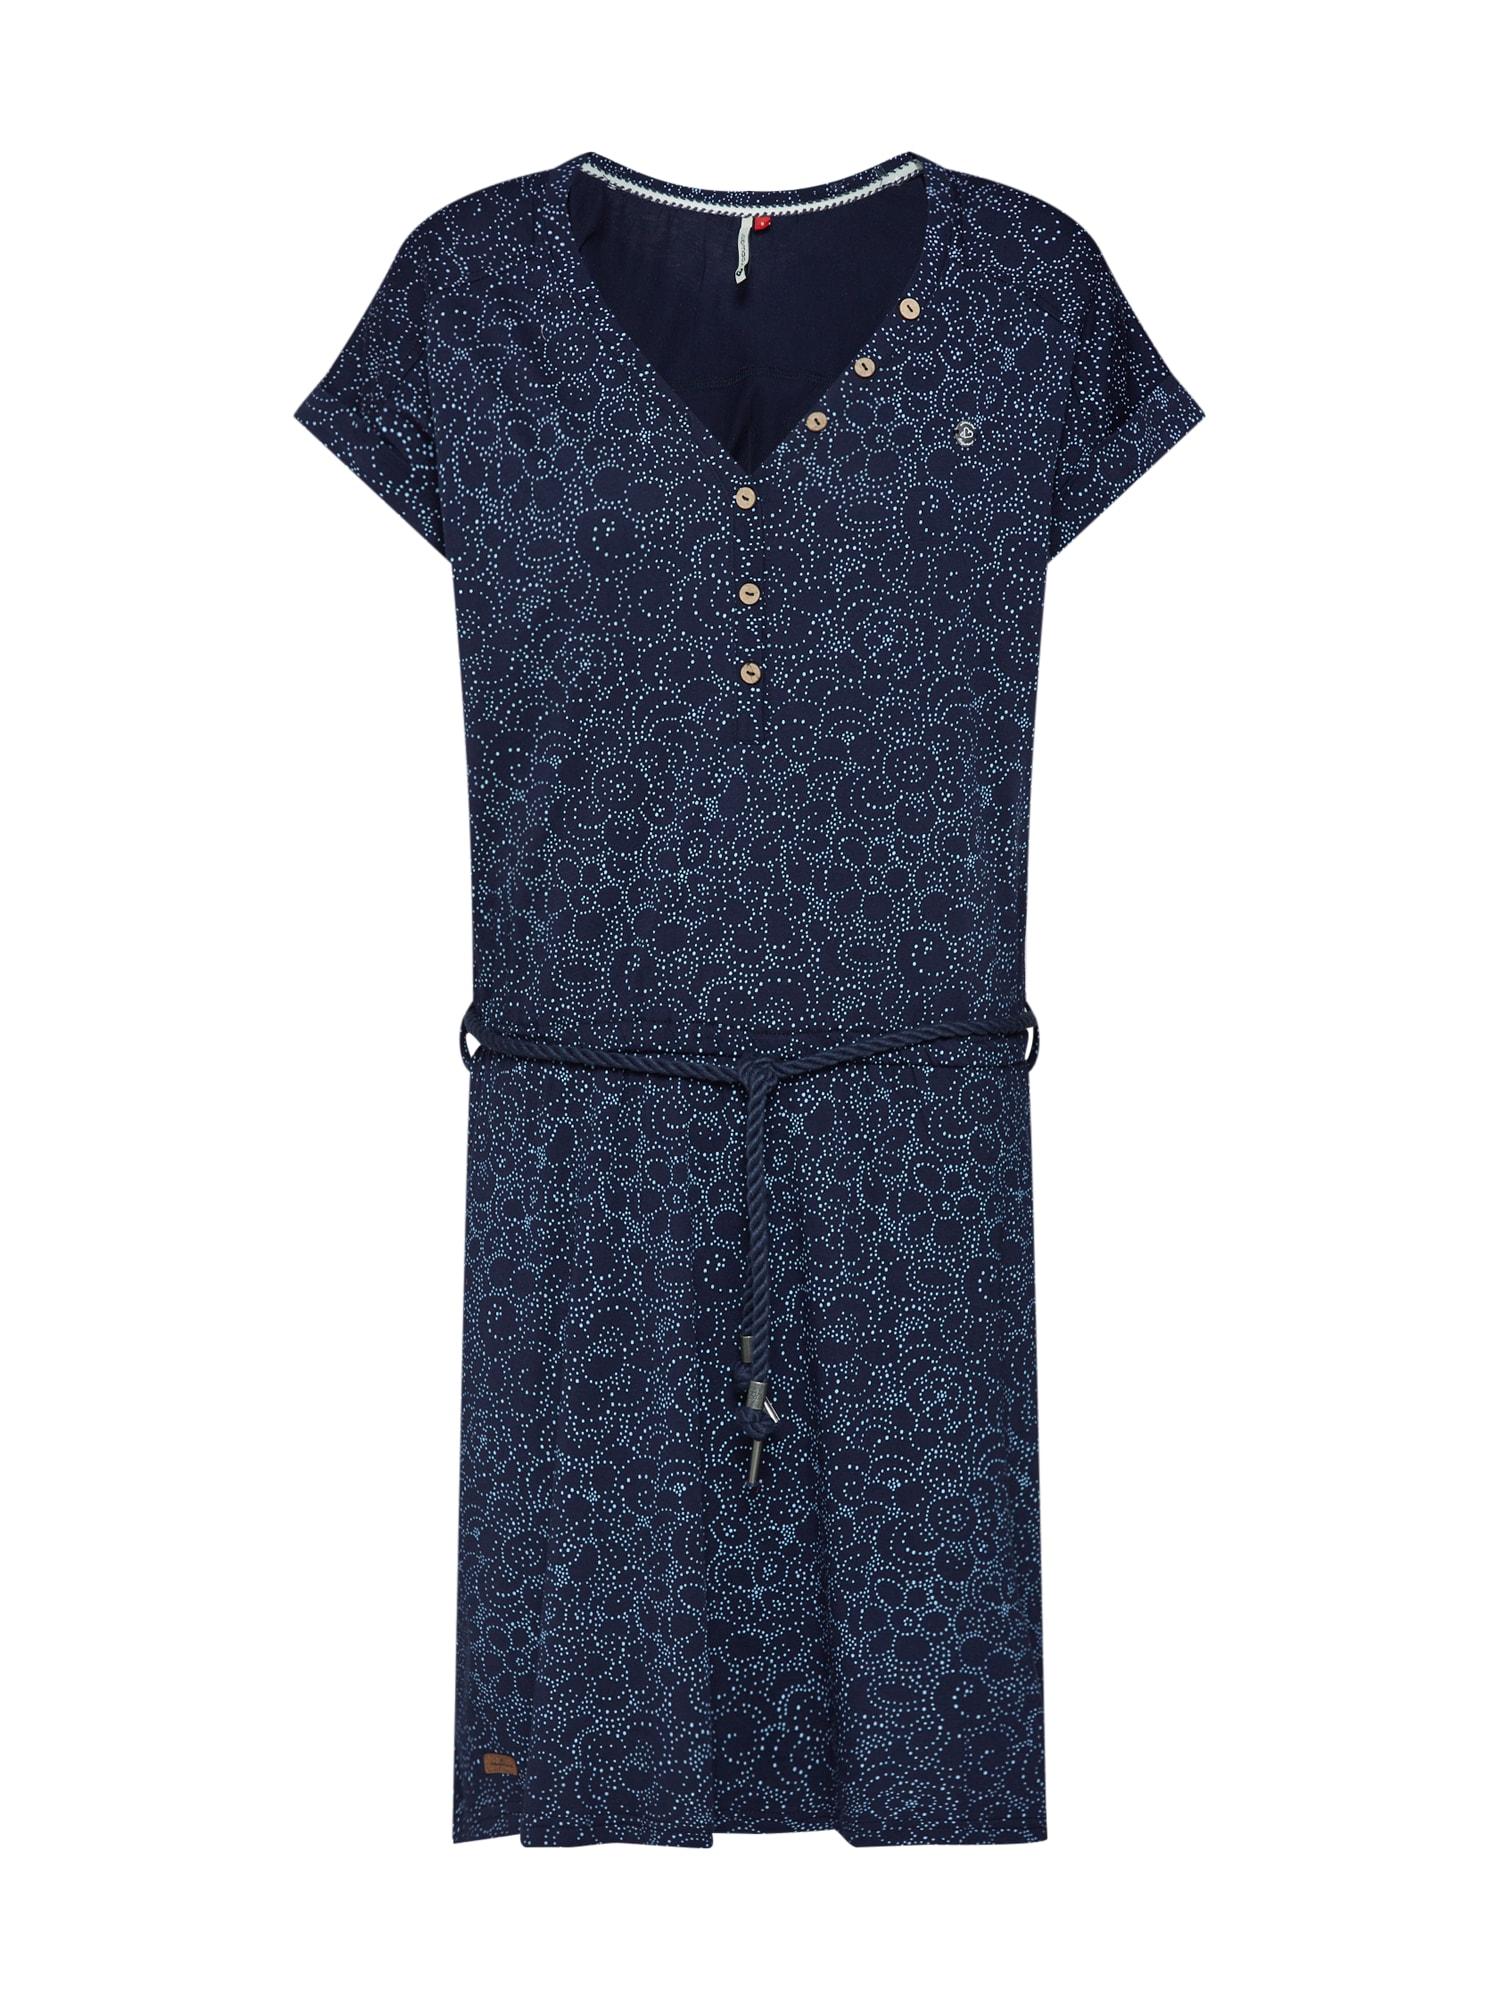 Šaty Brita námořnická modř světlemodrá Ragwear